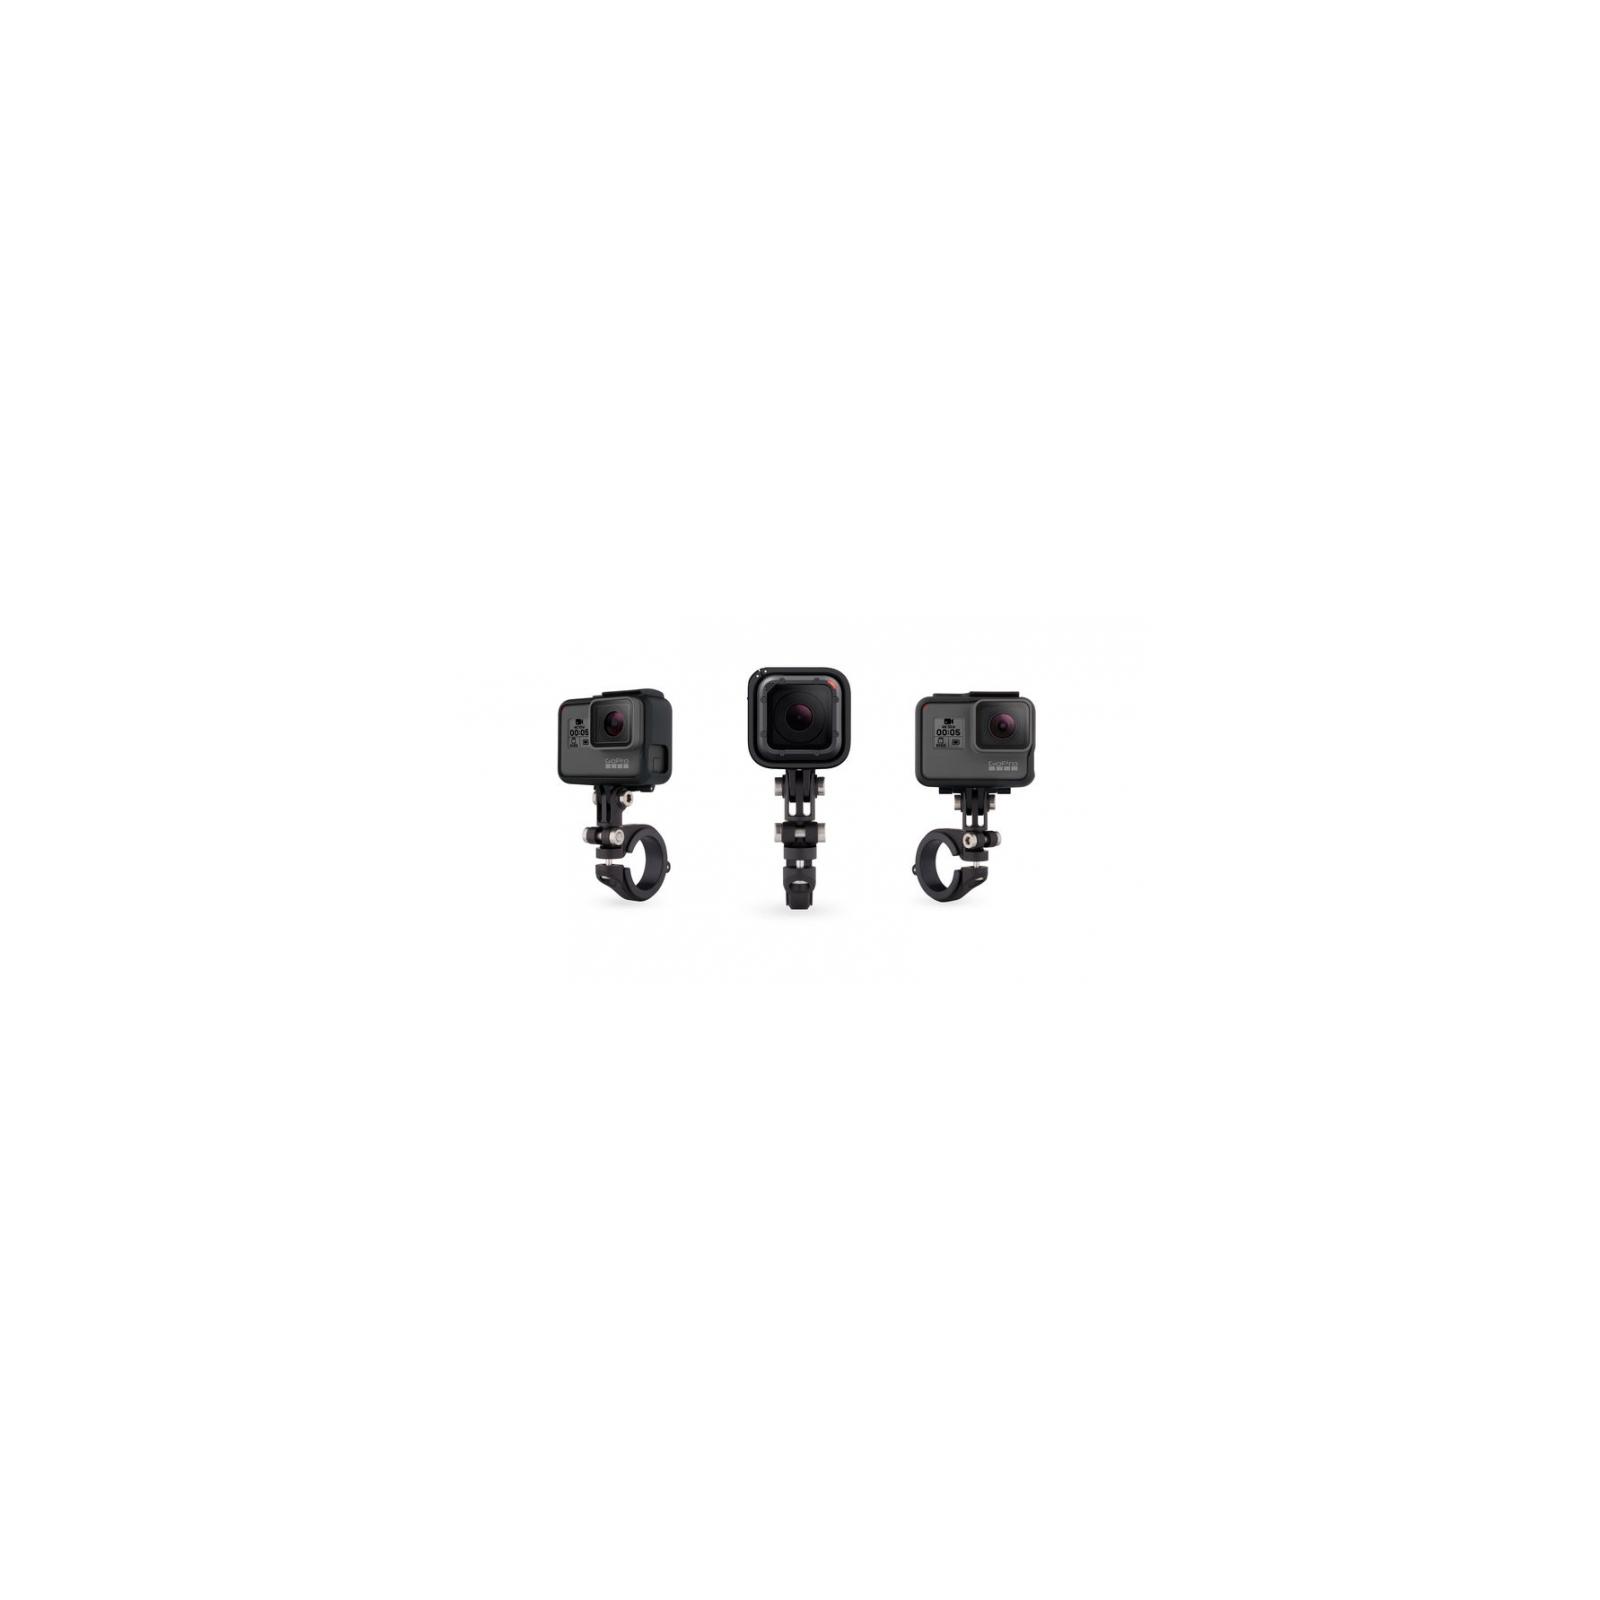 Аксессуар к экшн-камерам GoPro Handlebar Seatpost Pole Mo (AMHSM-001) изображение 2